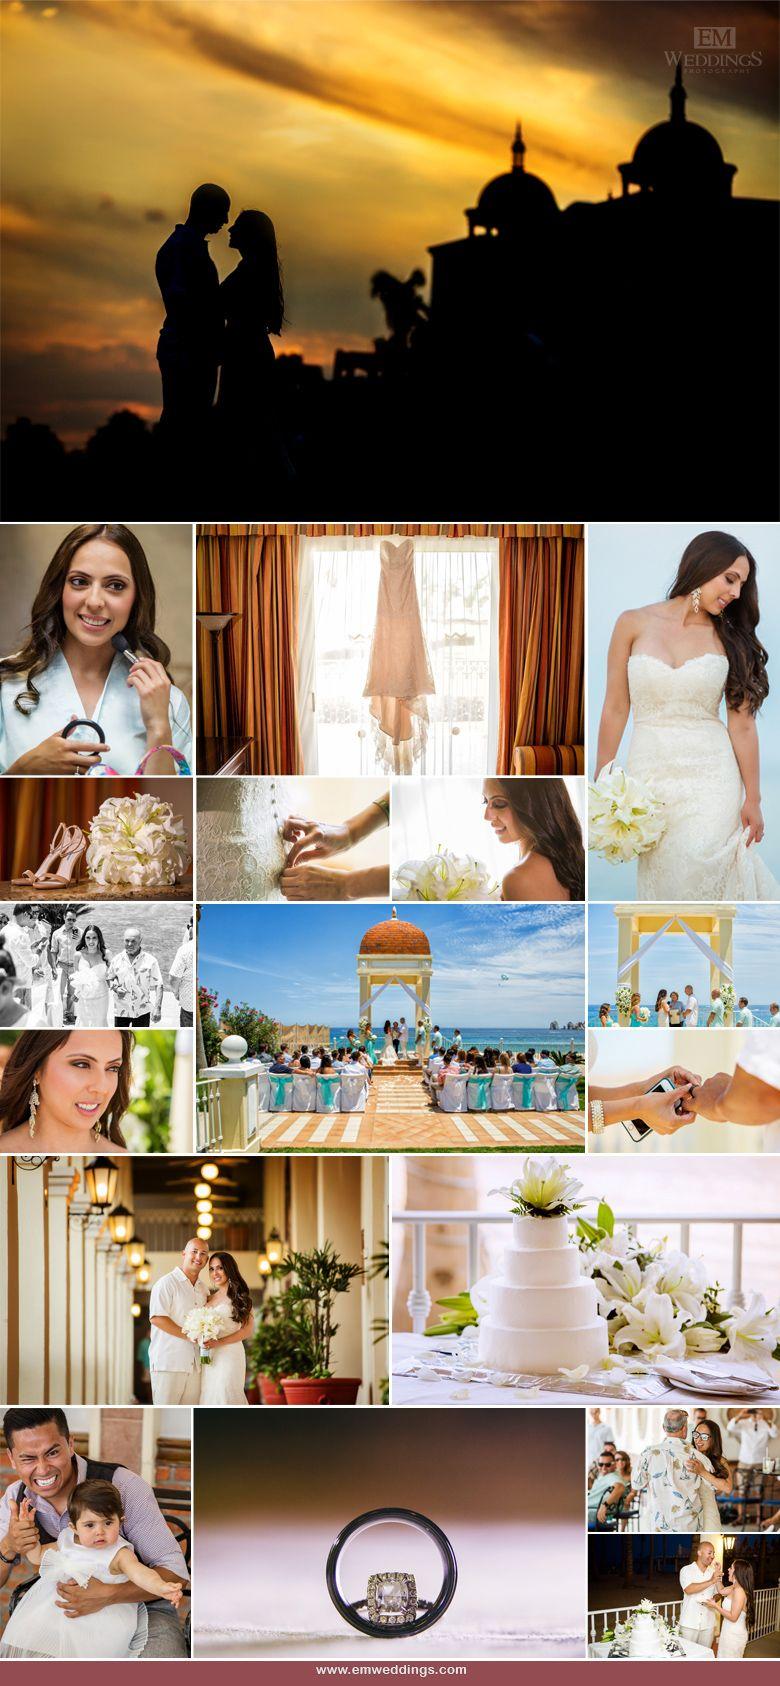 Adrian and Jessica I Hotel Riu Palace I Los Cabos, México. - Los Cabos Wedding - Beach Wedding - Weddings by RIU